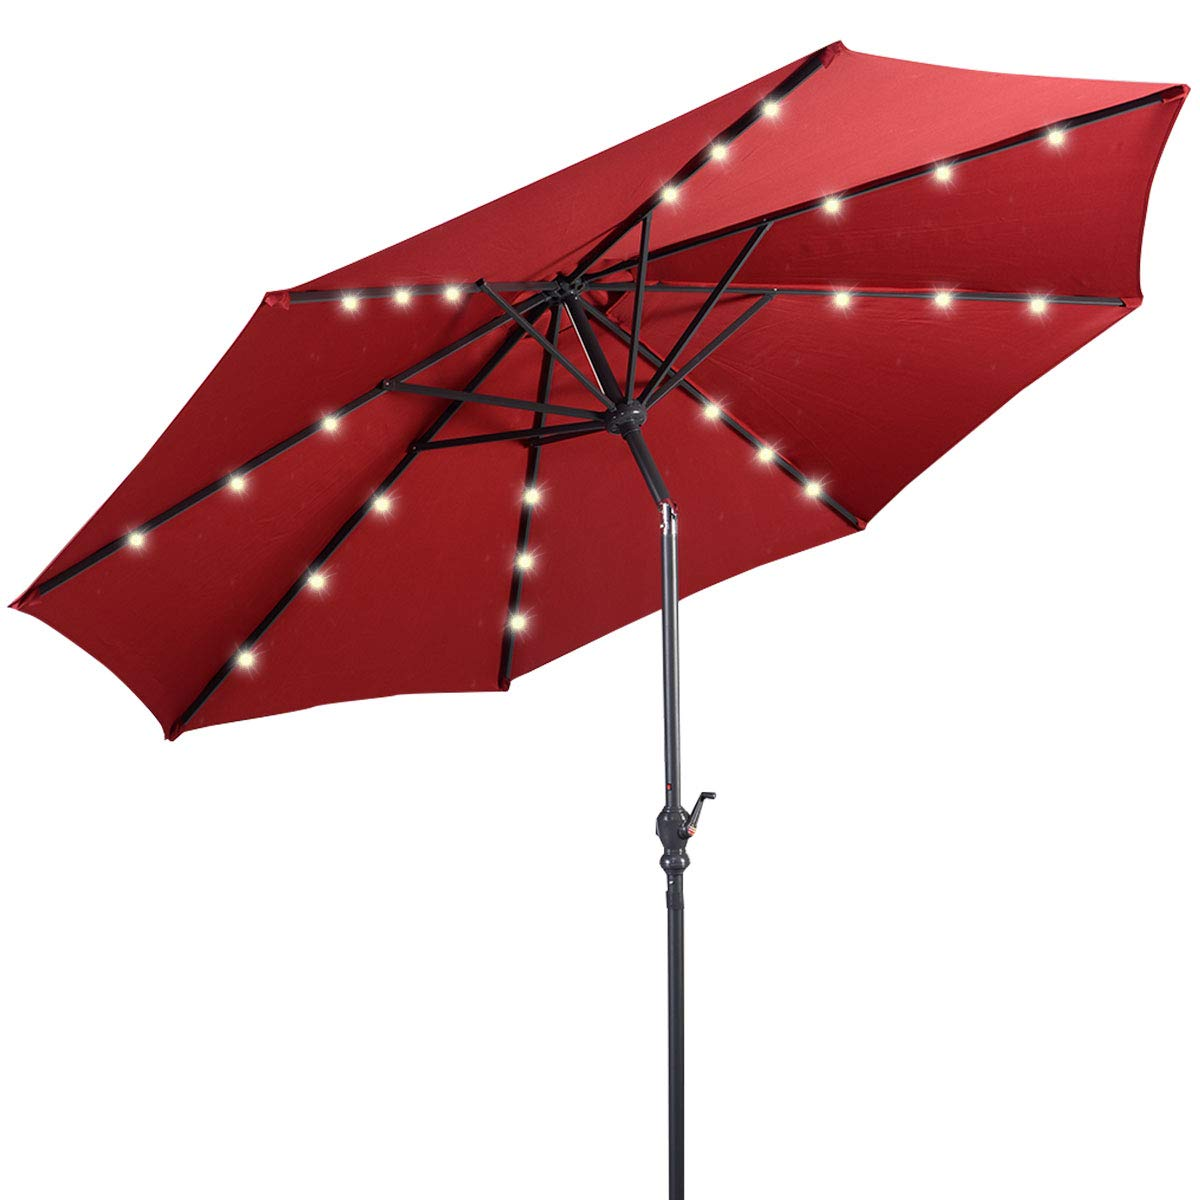 Giantex 10ft Solar Patio Umbrella Sunbrella with LED Lighted, 8 Ribs Market Steel Tilt w/Crank for Garden, Deck, Backyard, Pool Indoor Outdoor Use, Burgundy